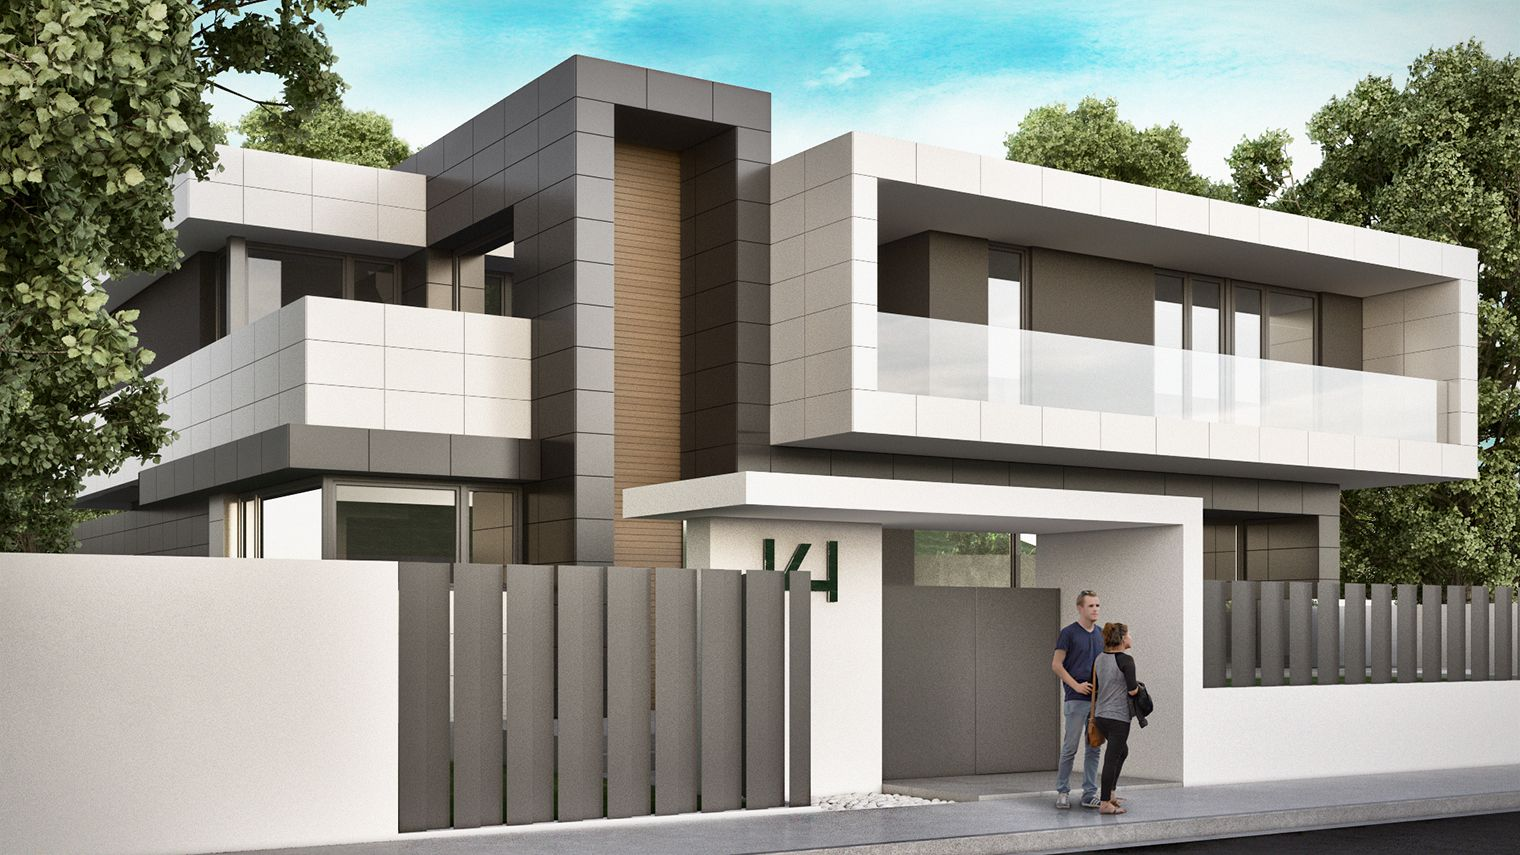 Viviendas unifamiliares minimalistas buscar con google - Fachadas viviendas unifamiliares ...